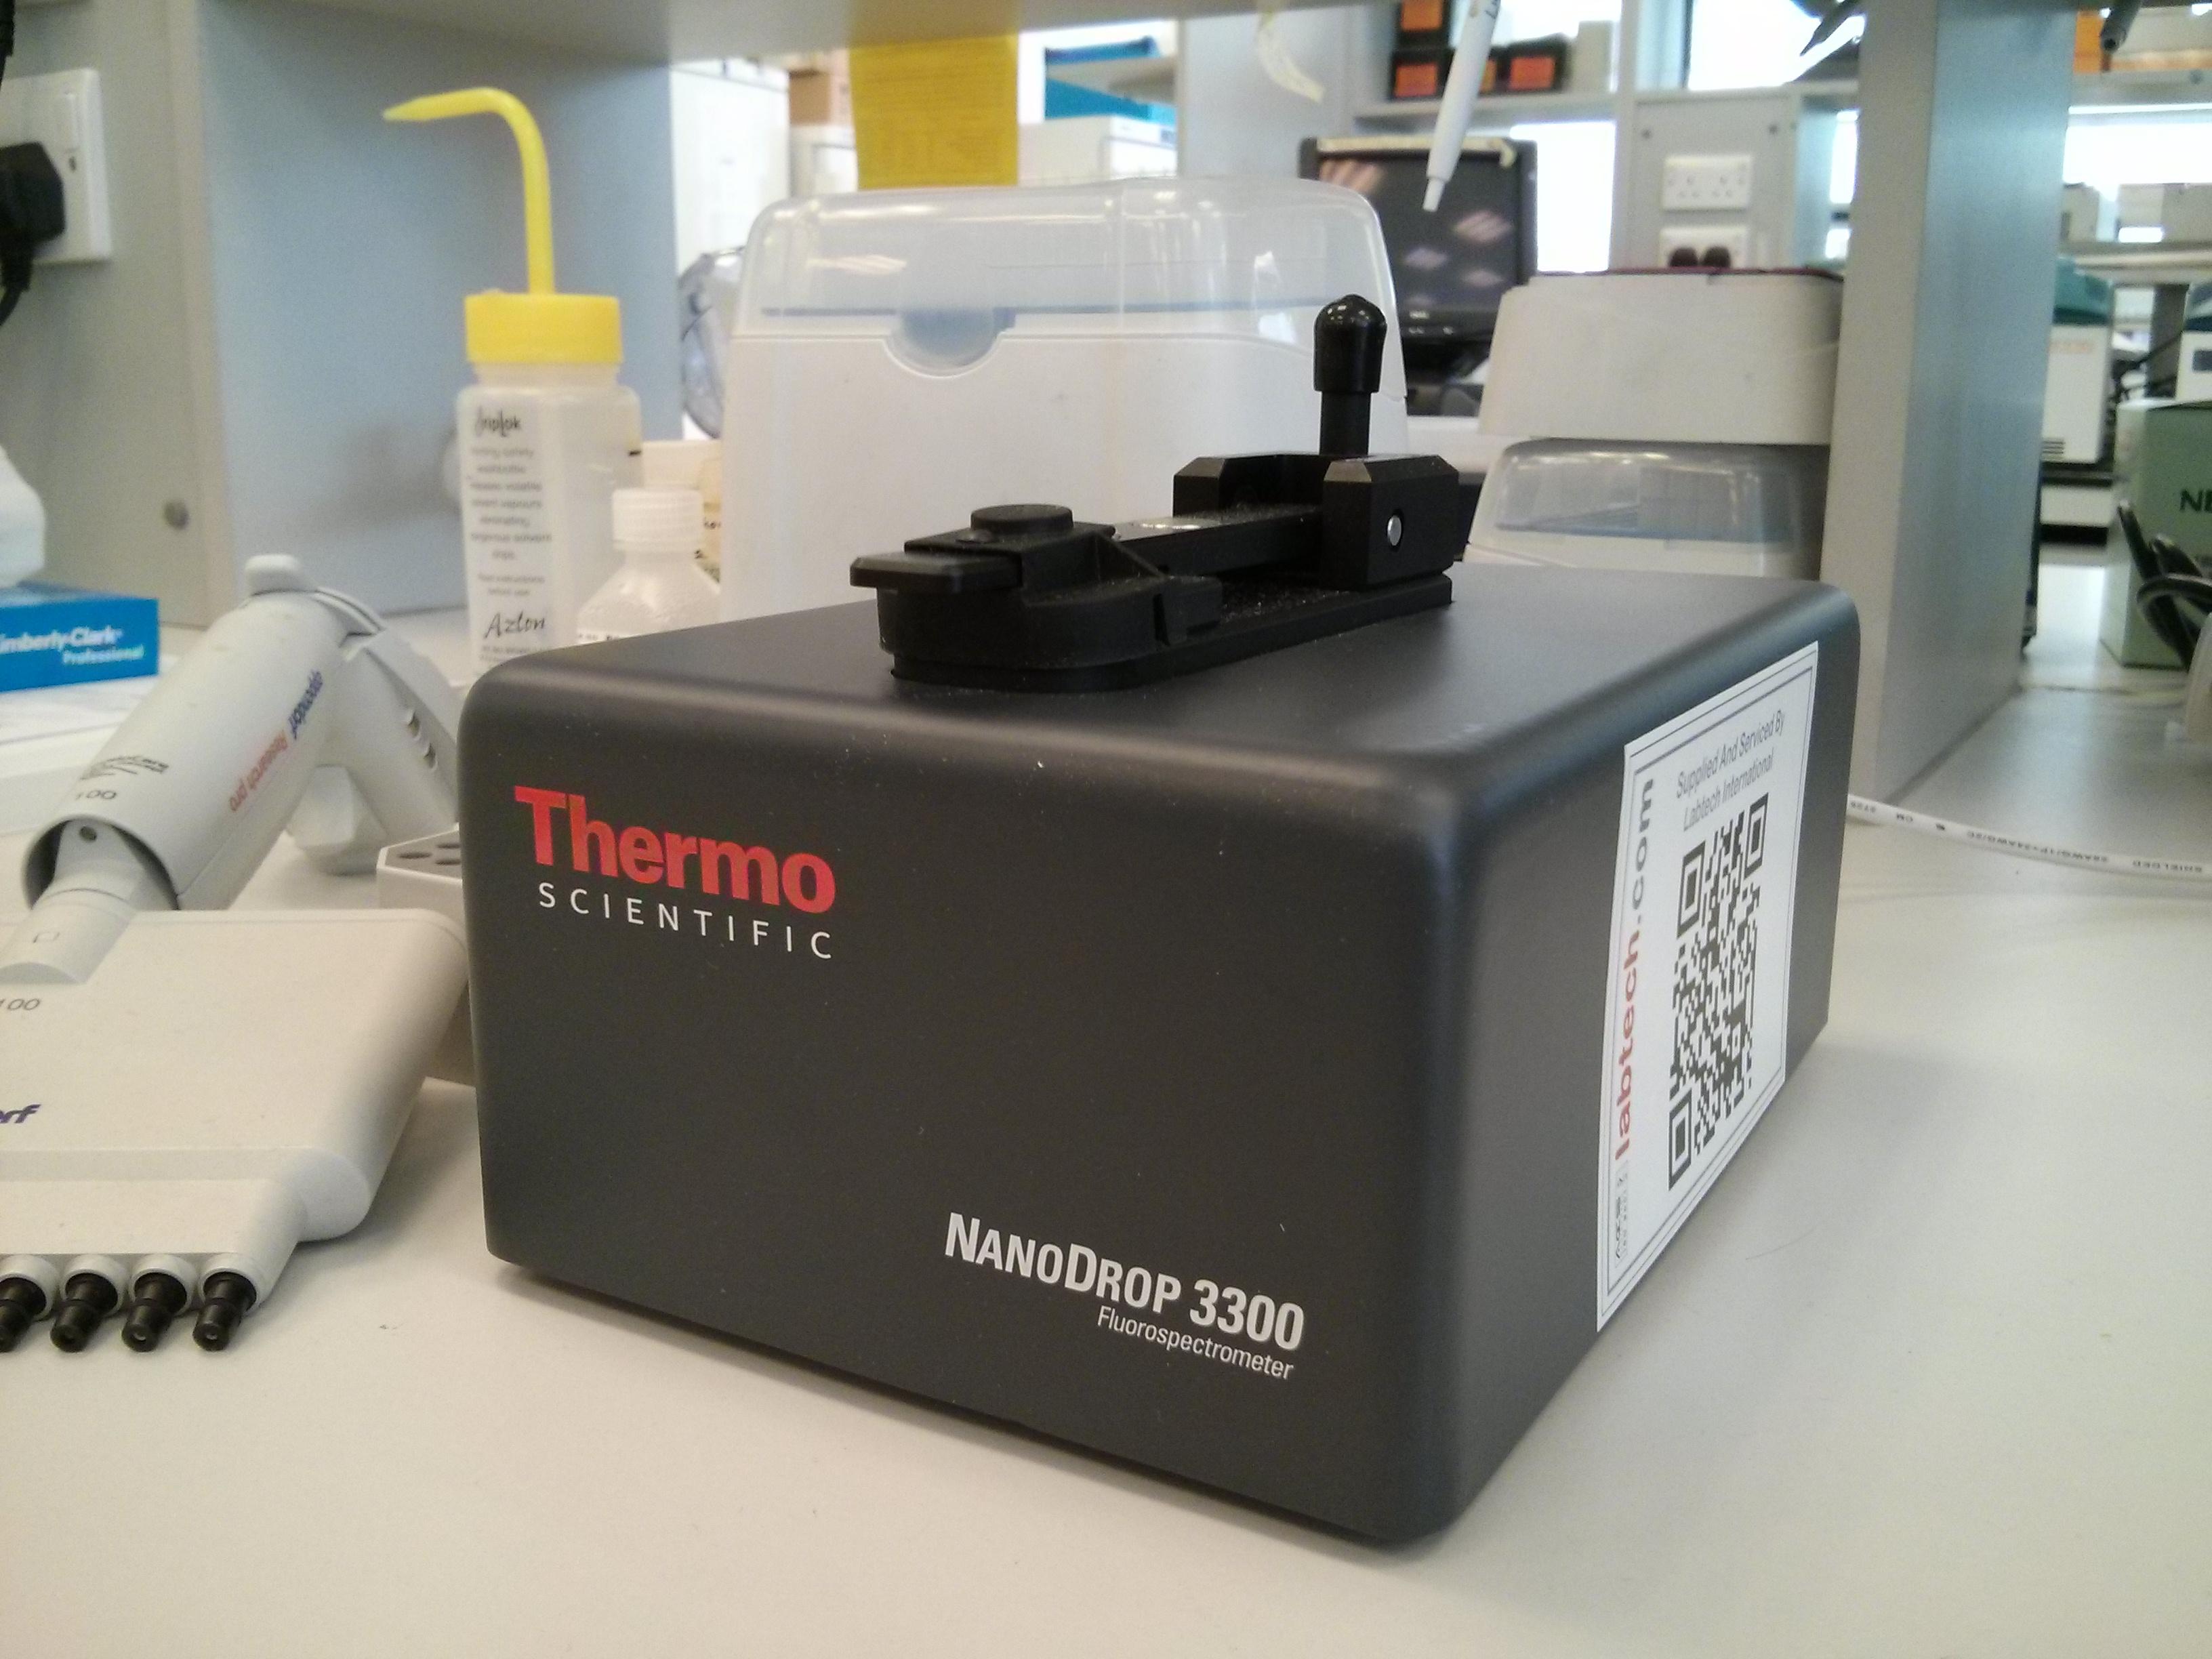 Fluorospectrometer